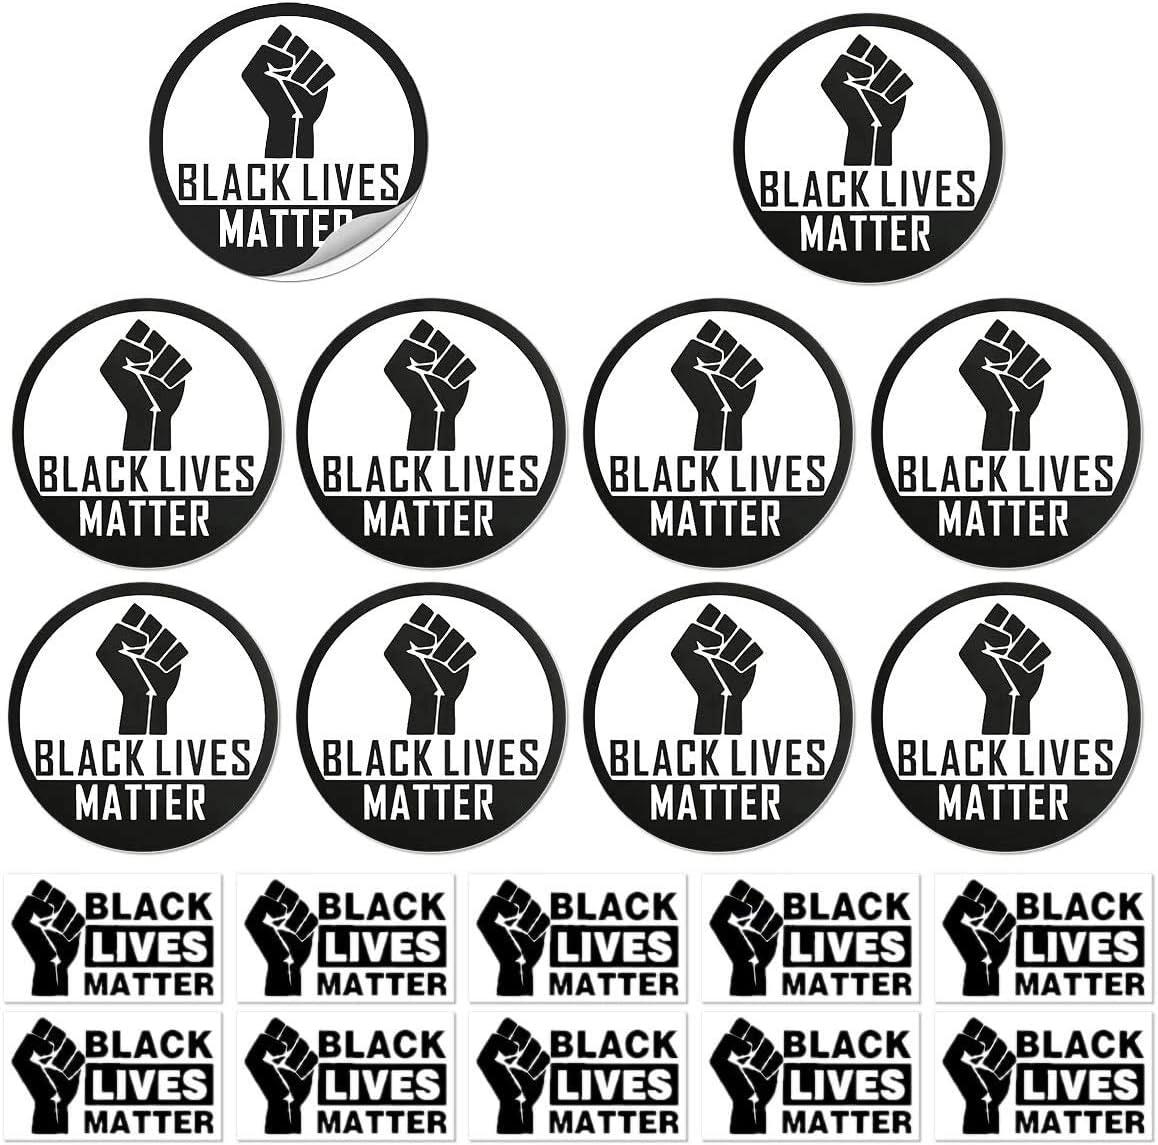 20PCS Black Lives Matter Anti-Racism BLM Movement Bumper Sticker Magnet Car Window Sticker Laptop Decal